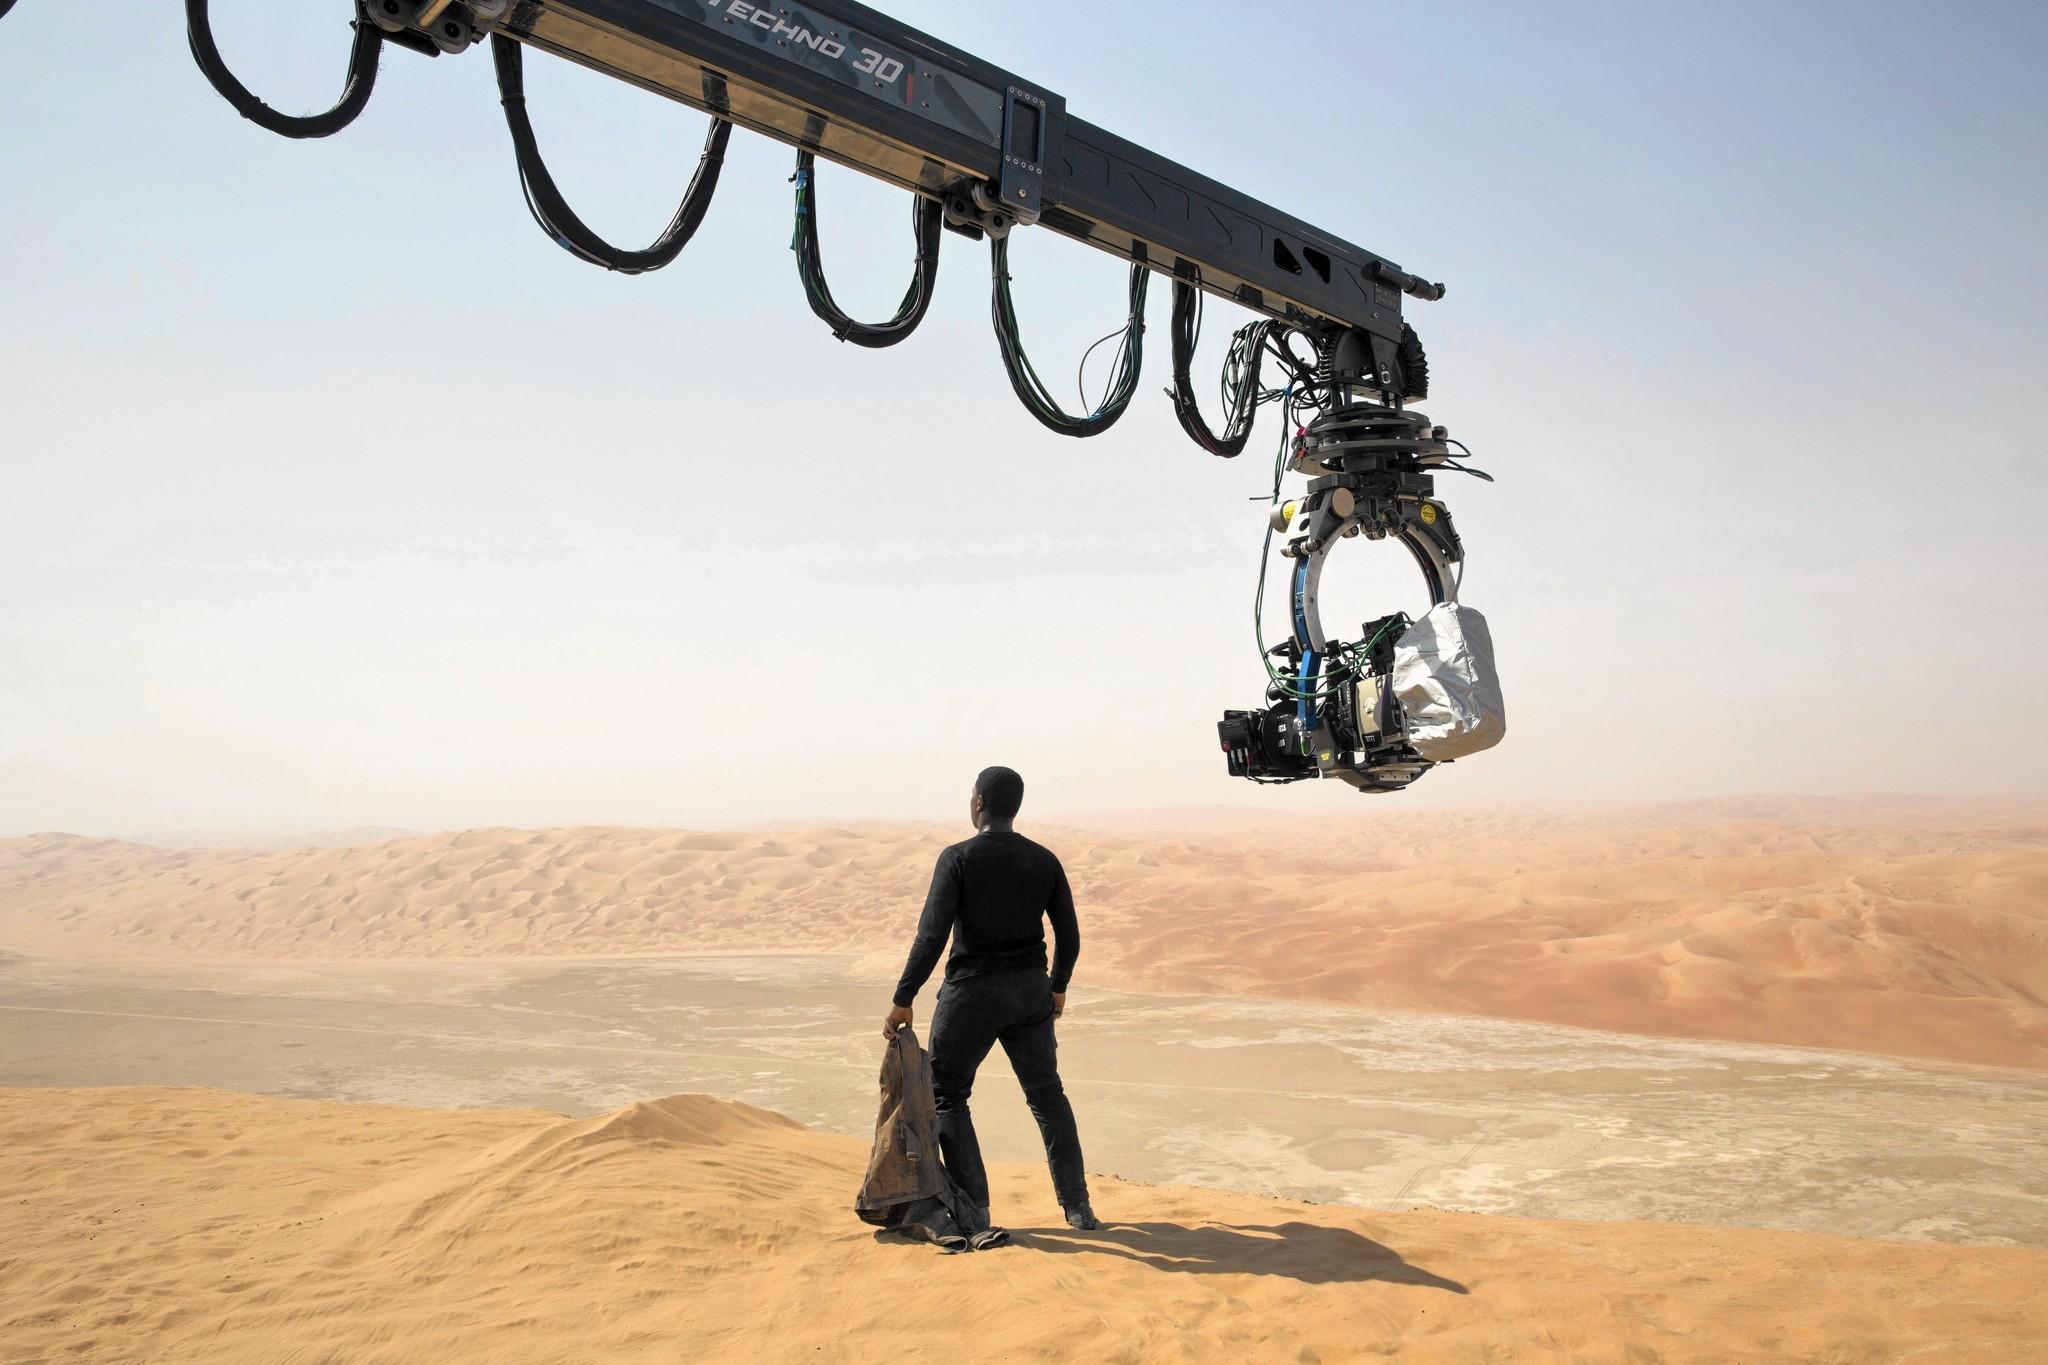 la-ca-hc-star-wars-filming-abu-dhabi-20151206.jpg